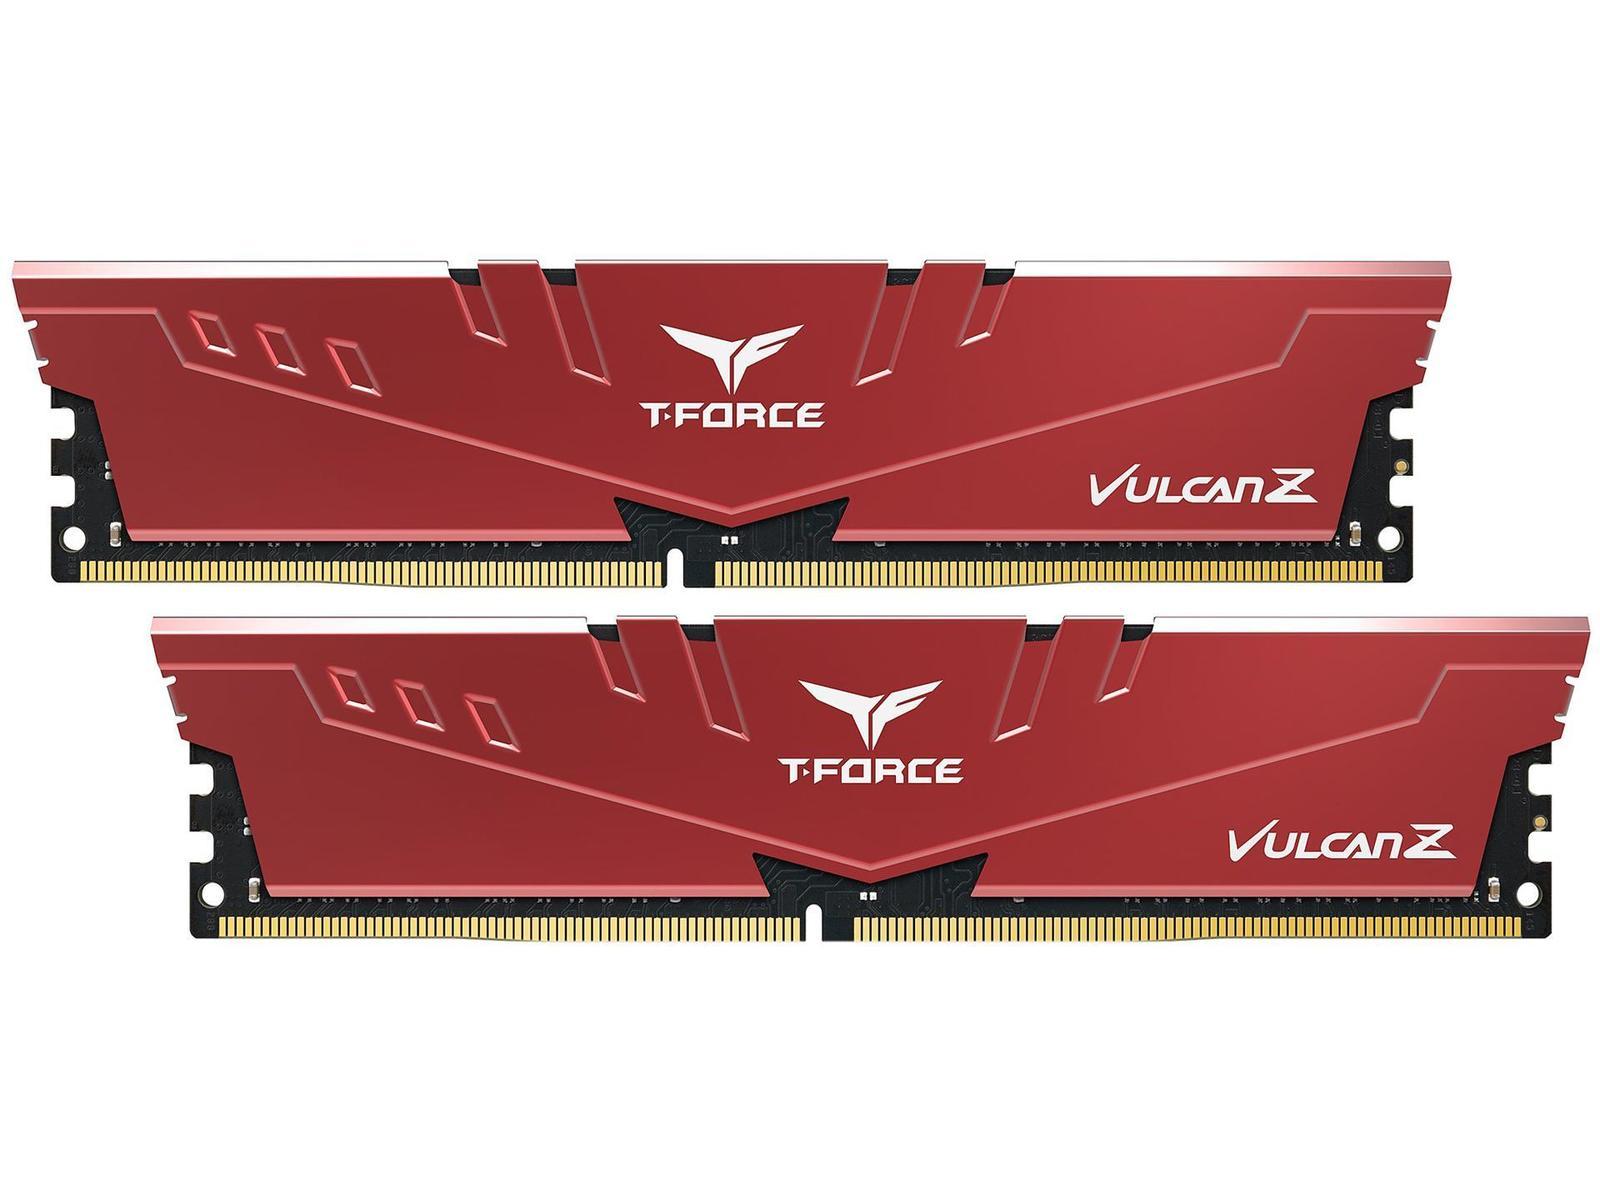 Team T-FORCE VULCAN Z 16 GB (2 x 8 GB) DDR4-3000 CL16 Memory